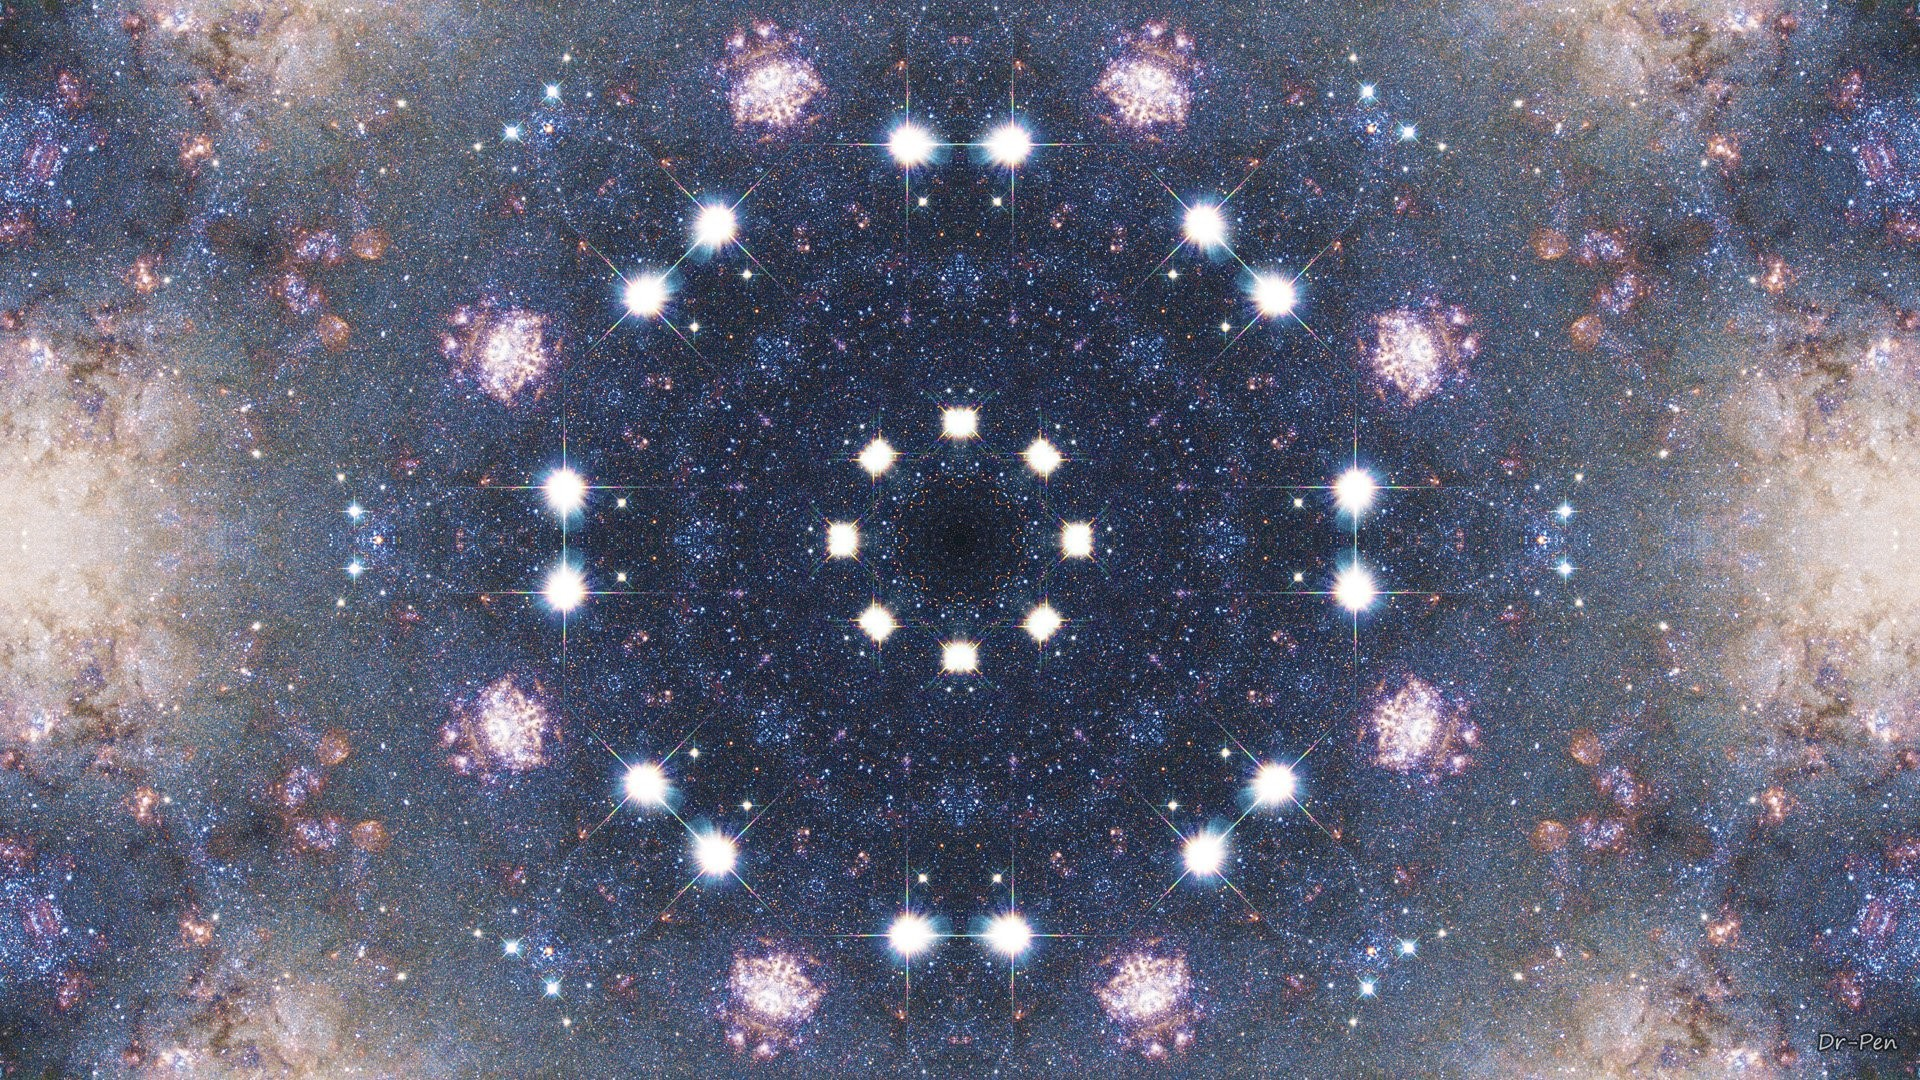 Abstract – Pattern Abstract Artistic Digital Mandala Manipulation Space  Stars Wallpaper